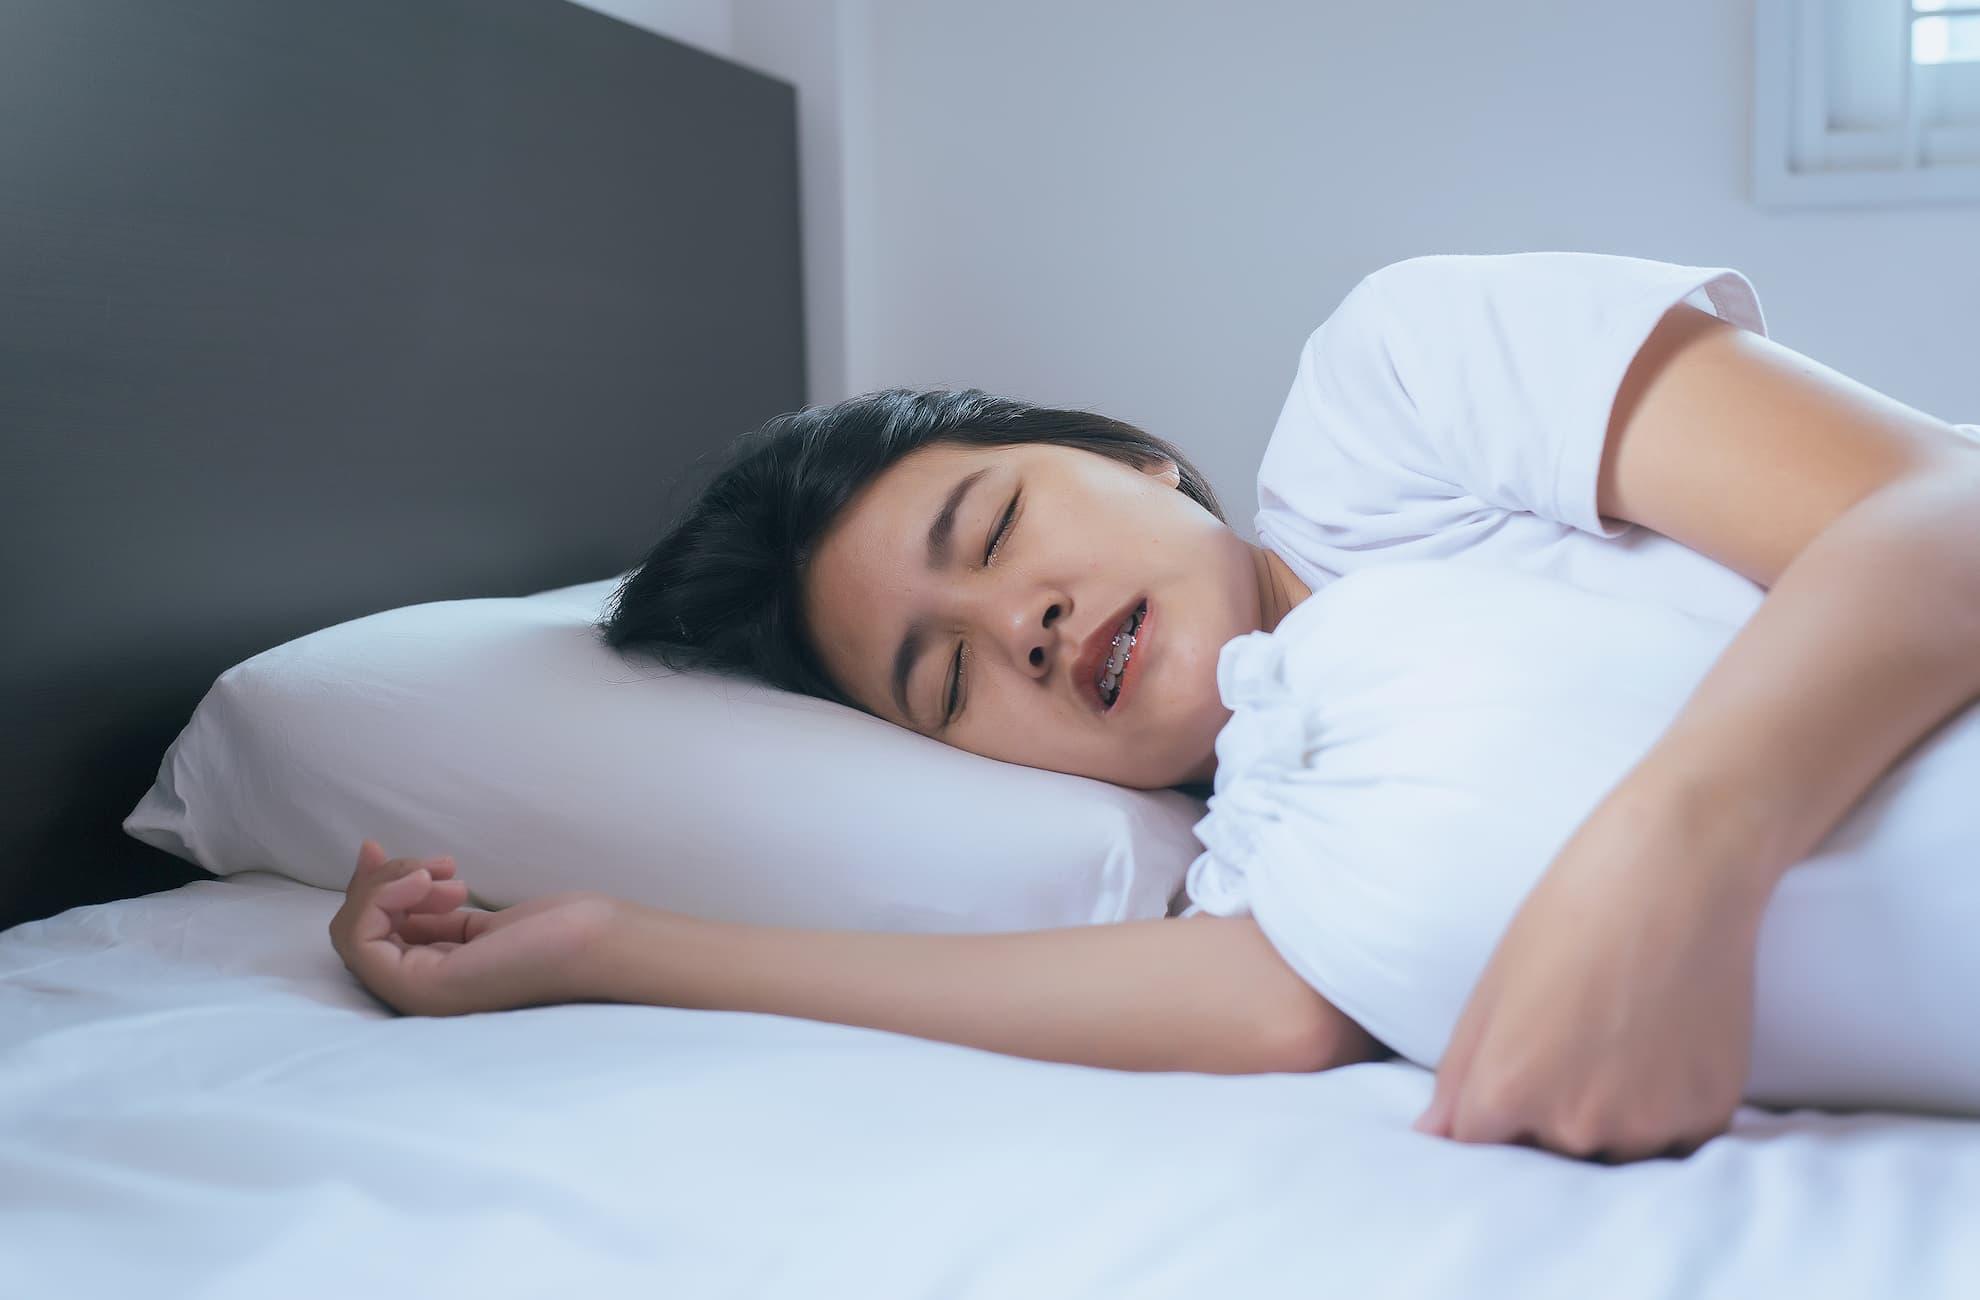 Women-Sleeping-On-The-Bed